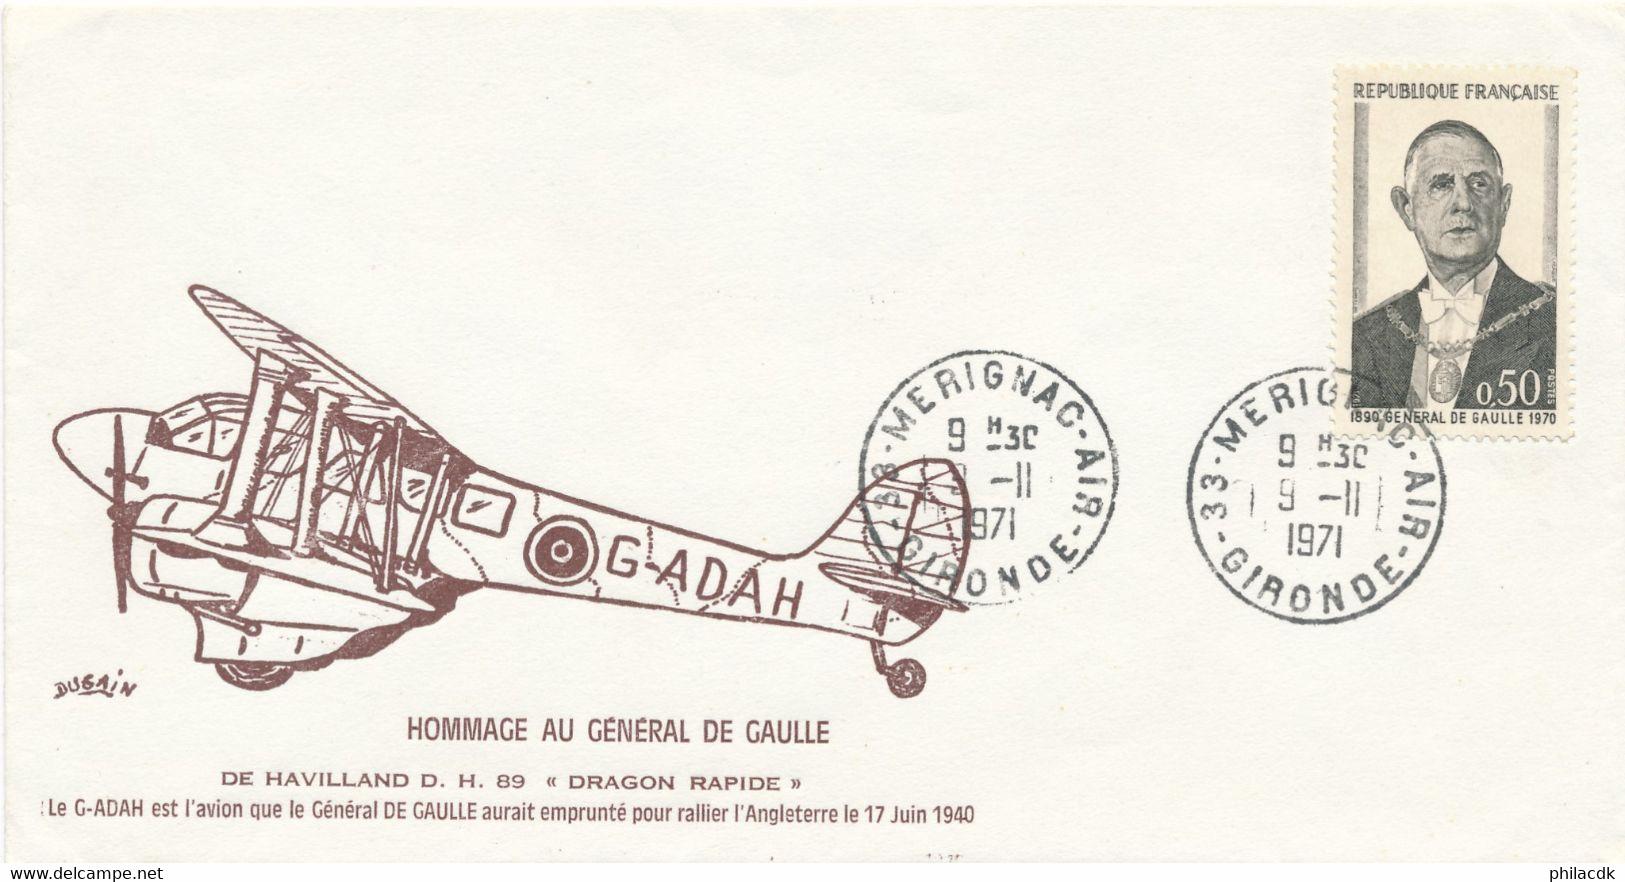 BEAU LOT FDC CARTES ENVELOPPES BLOCS TIMBRES DENTELES NON DENTELES GENERAL CHARLES DE GAULLE - De Gaulle (General)